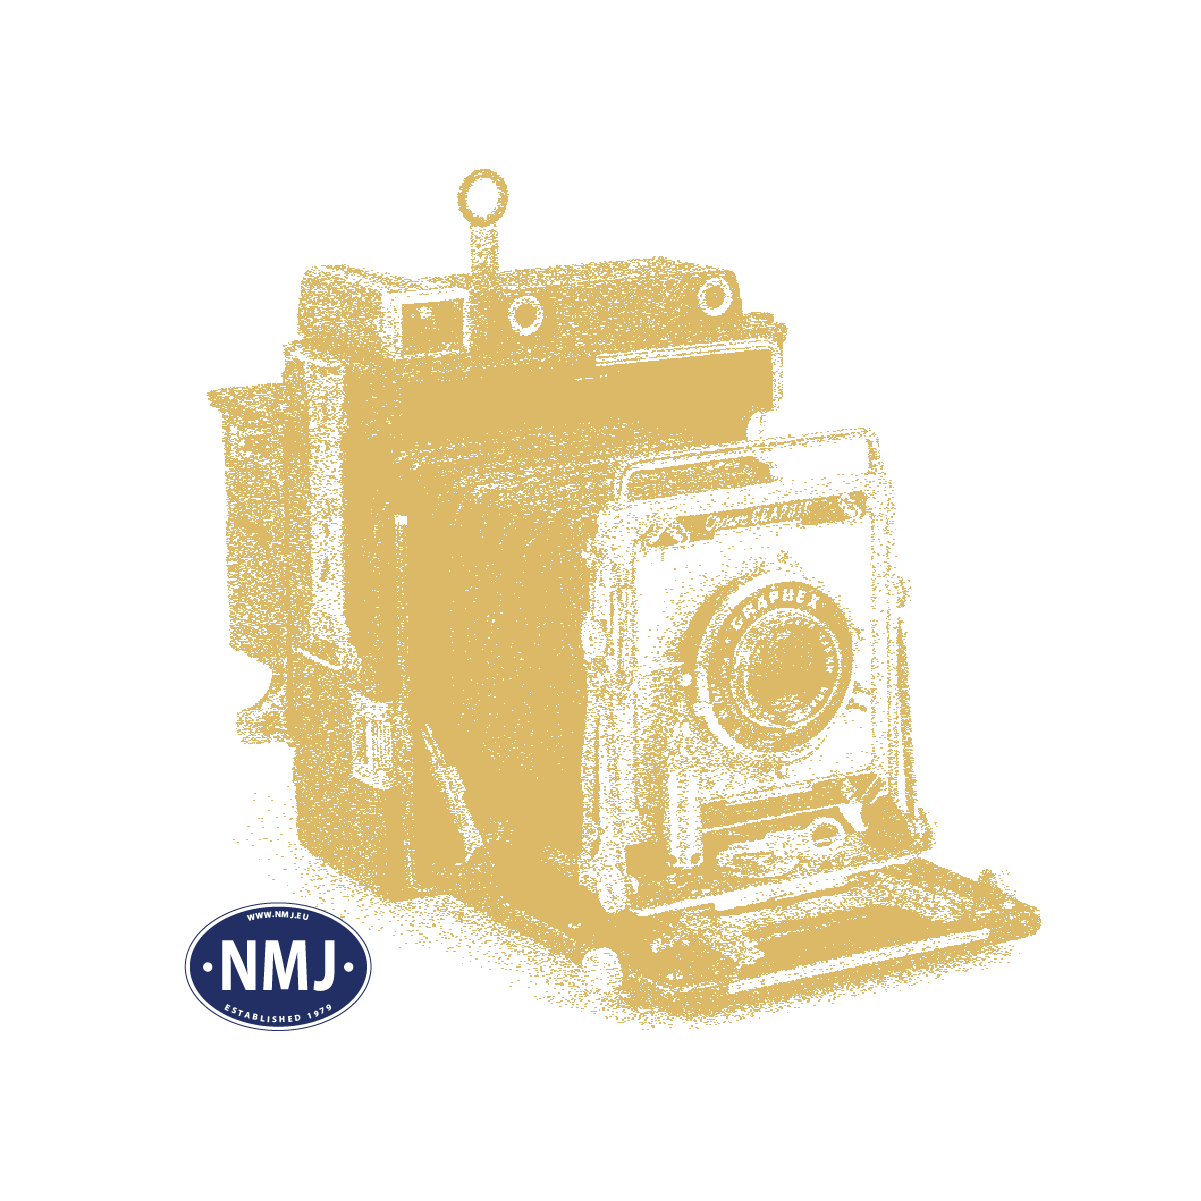 NOC16800 - Robåt